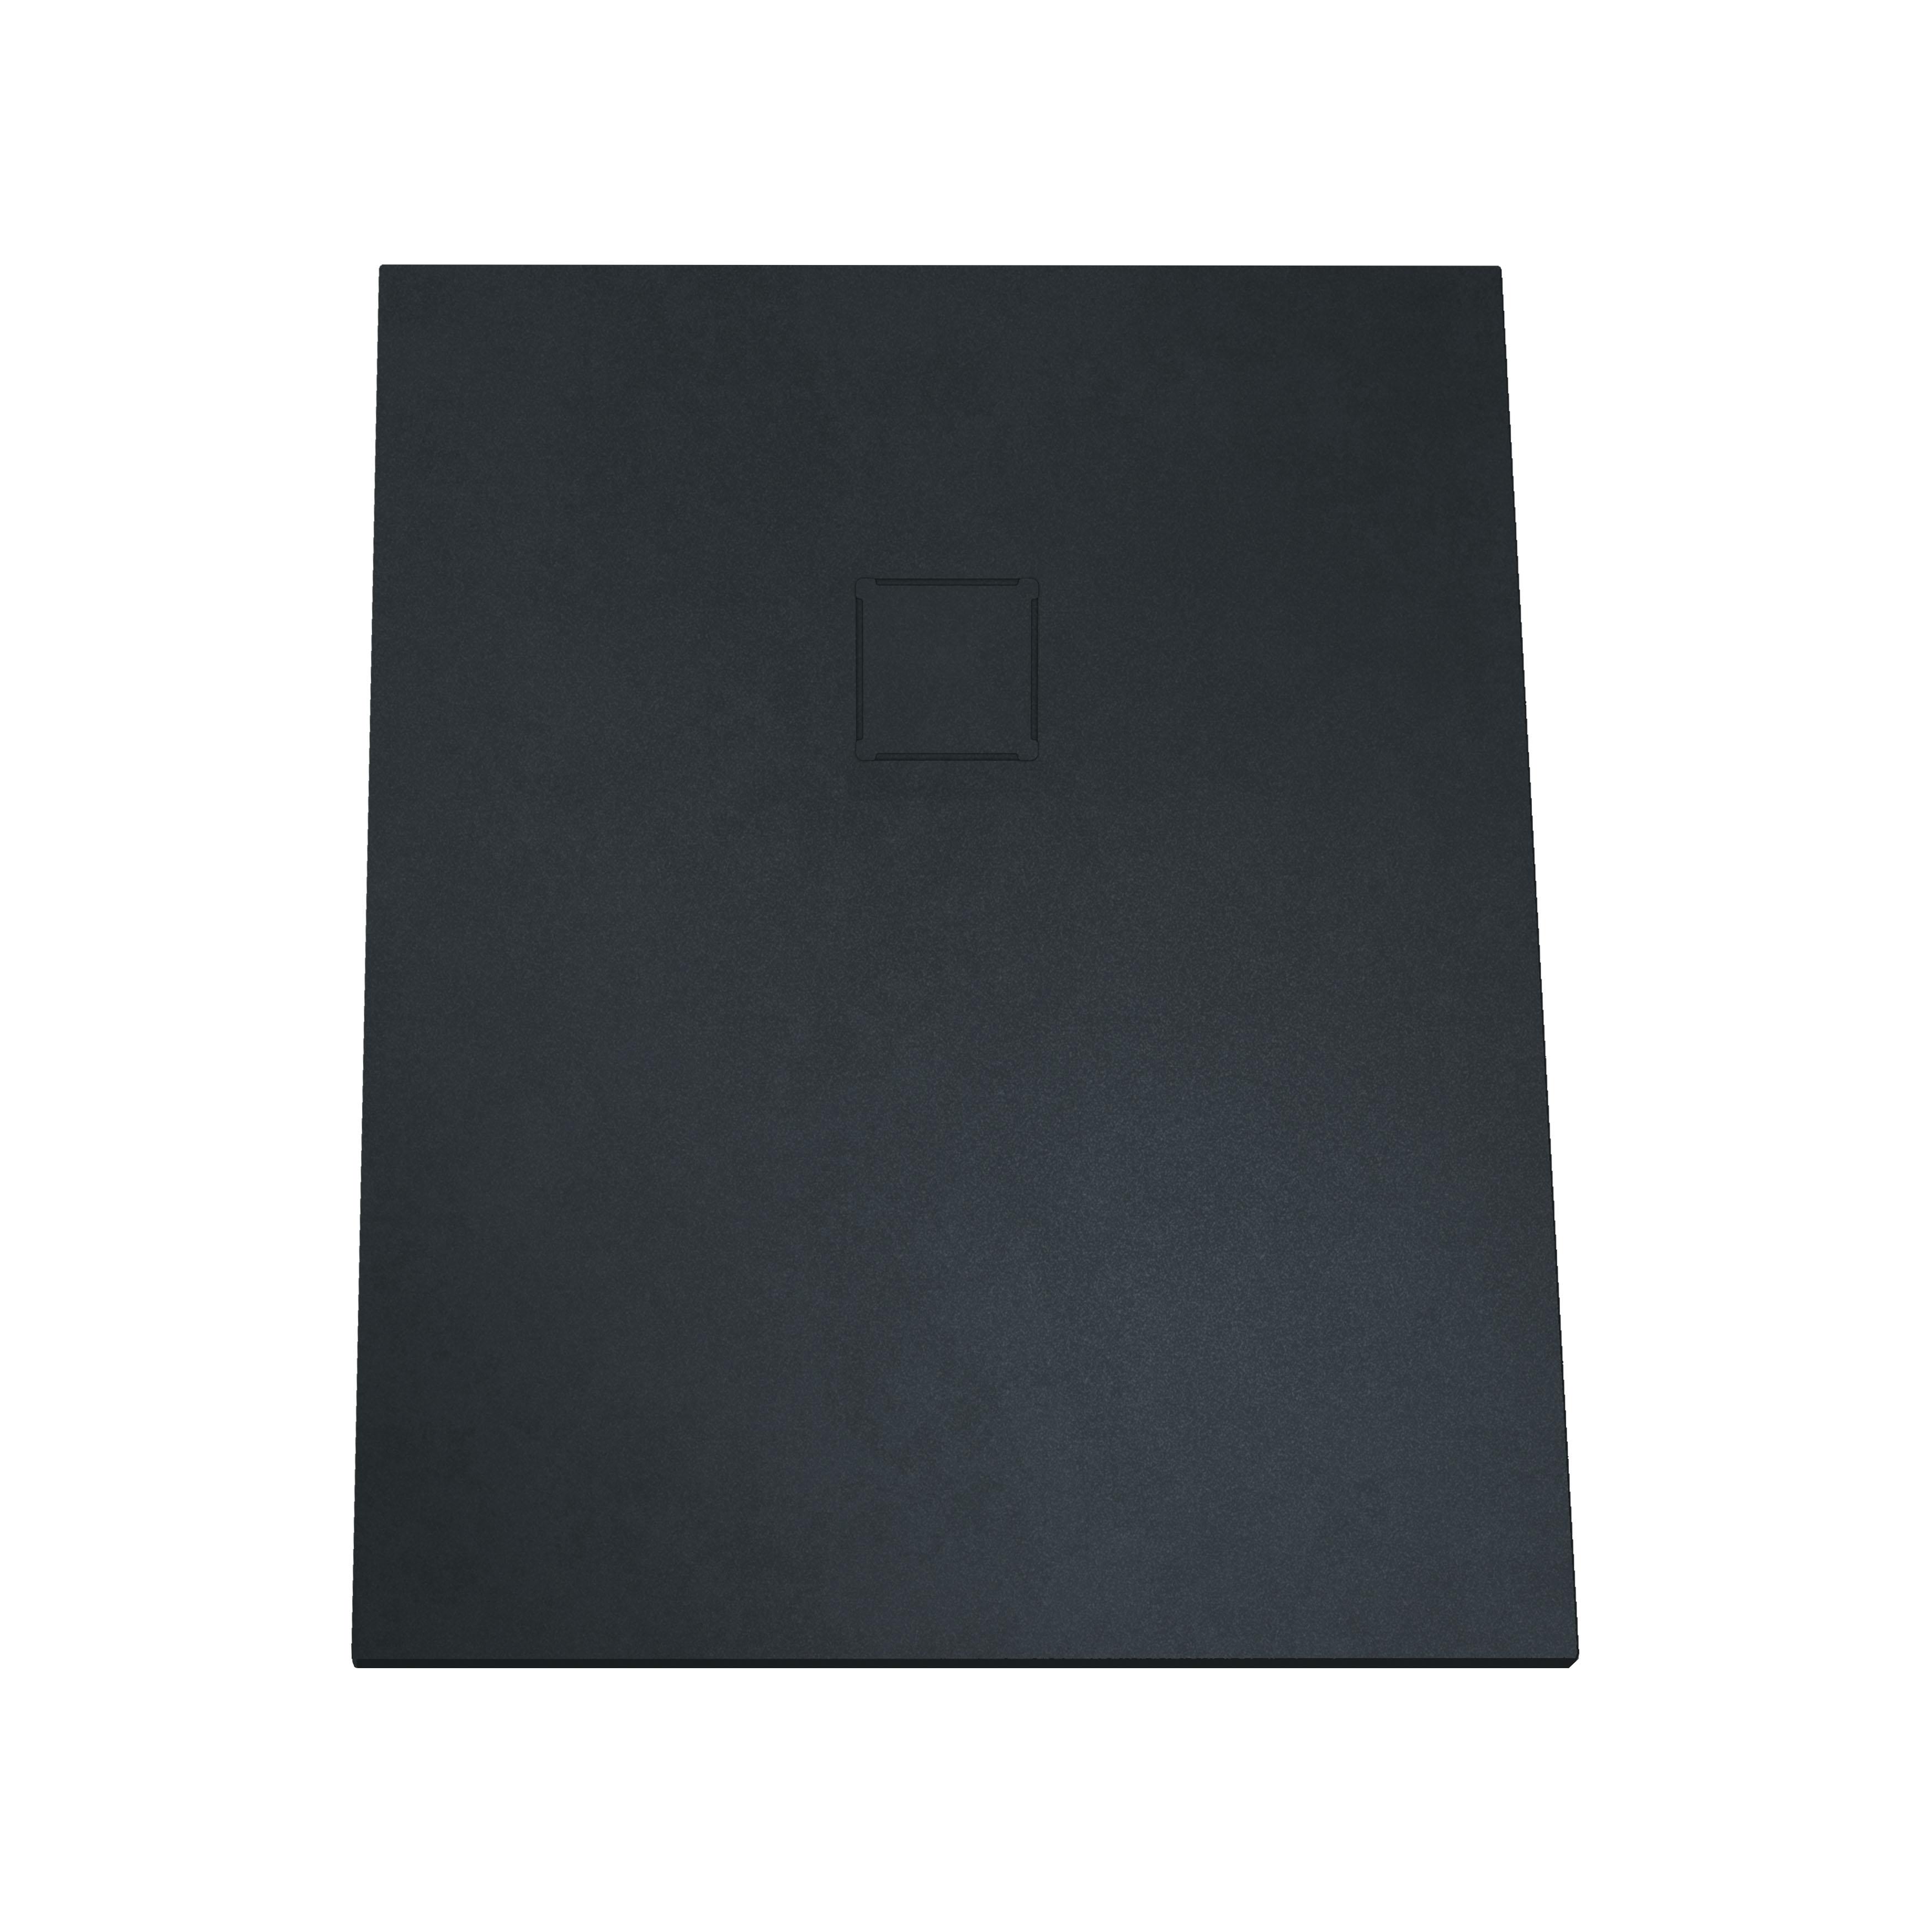 V-stone, receveur ultra plat en solid stone, 100  x  70 cm, anthraciteacite